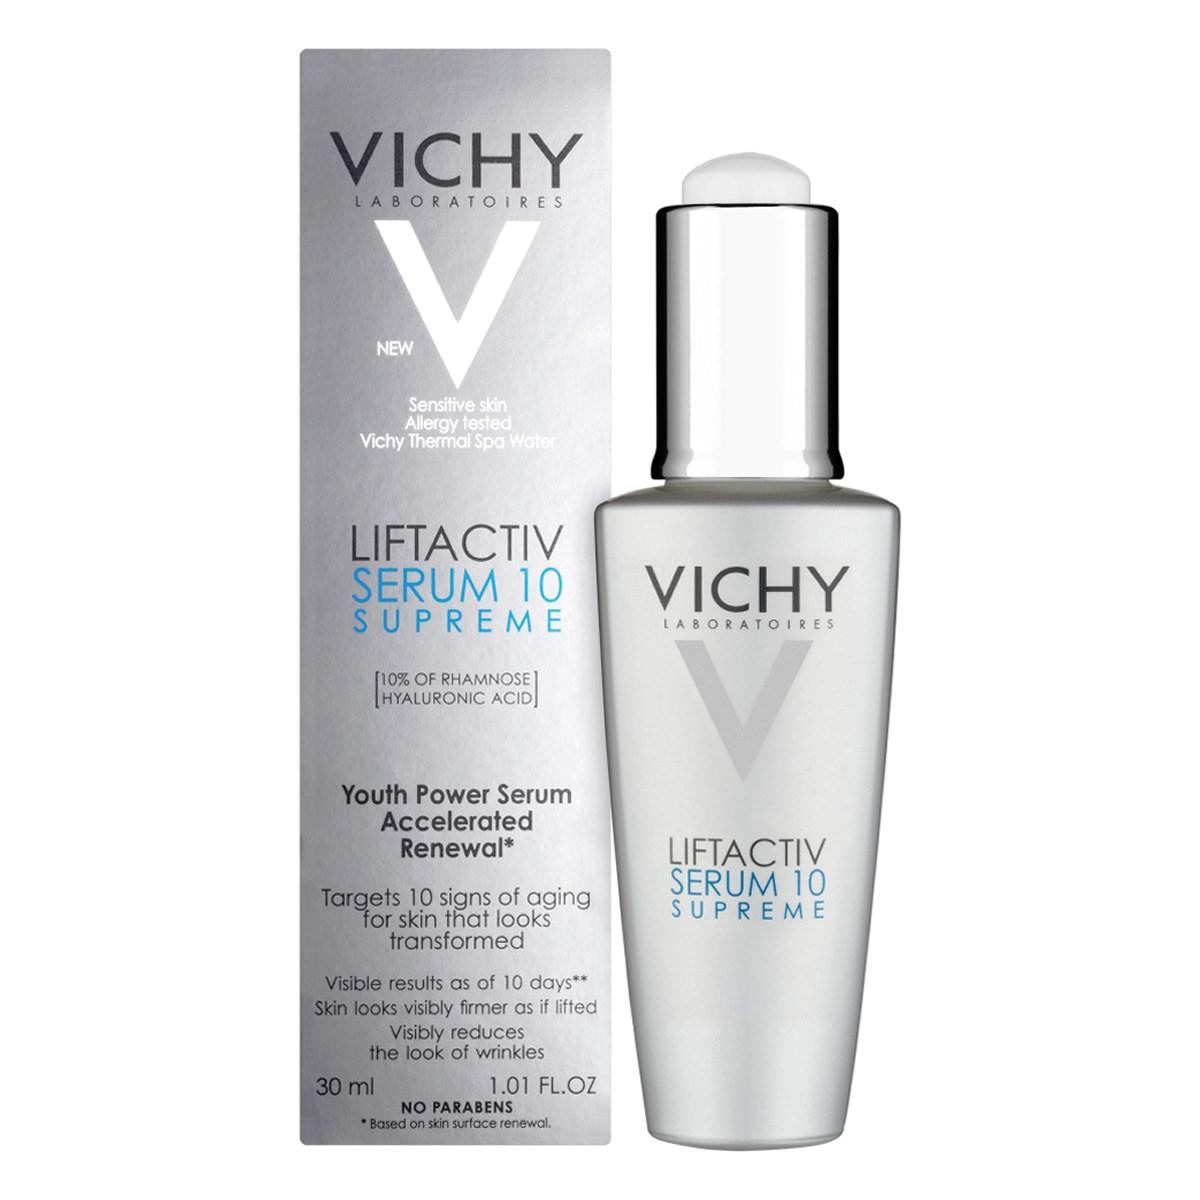 Vichy LIFTACTIV Serum 10 Supreme Serum